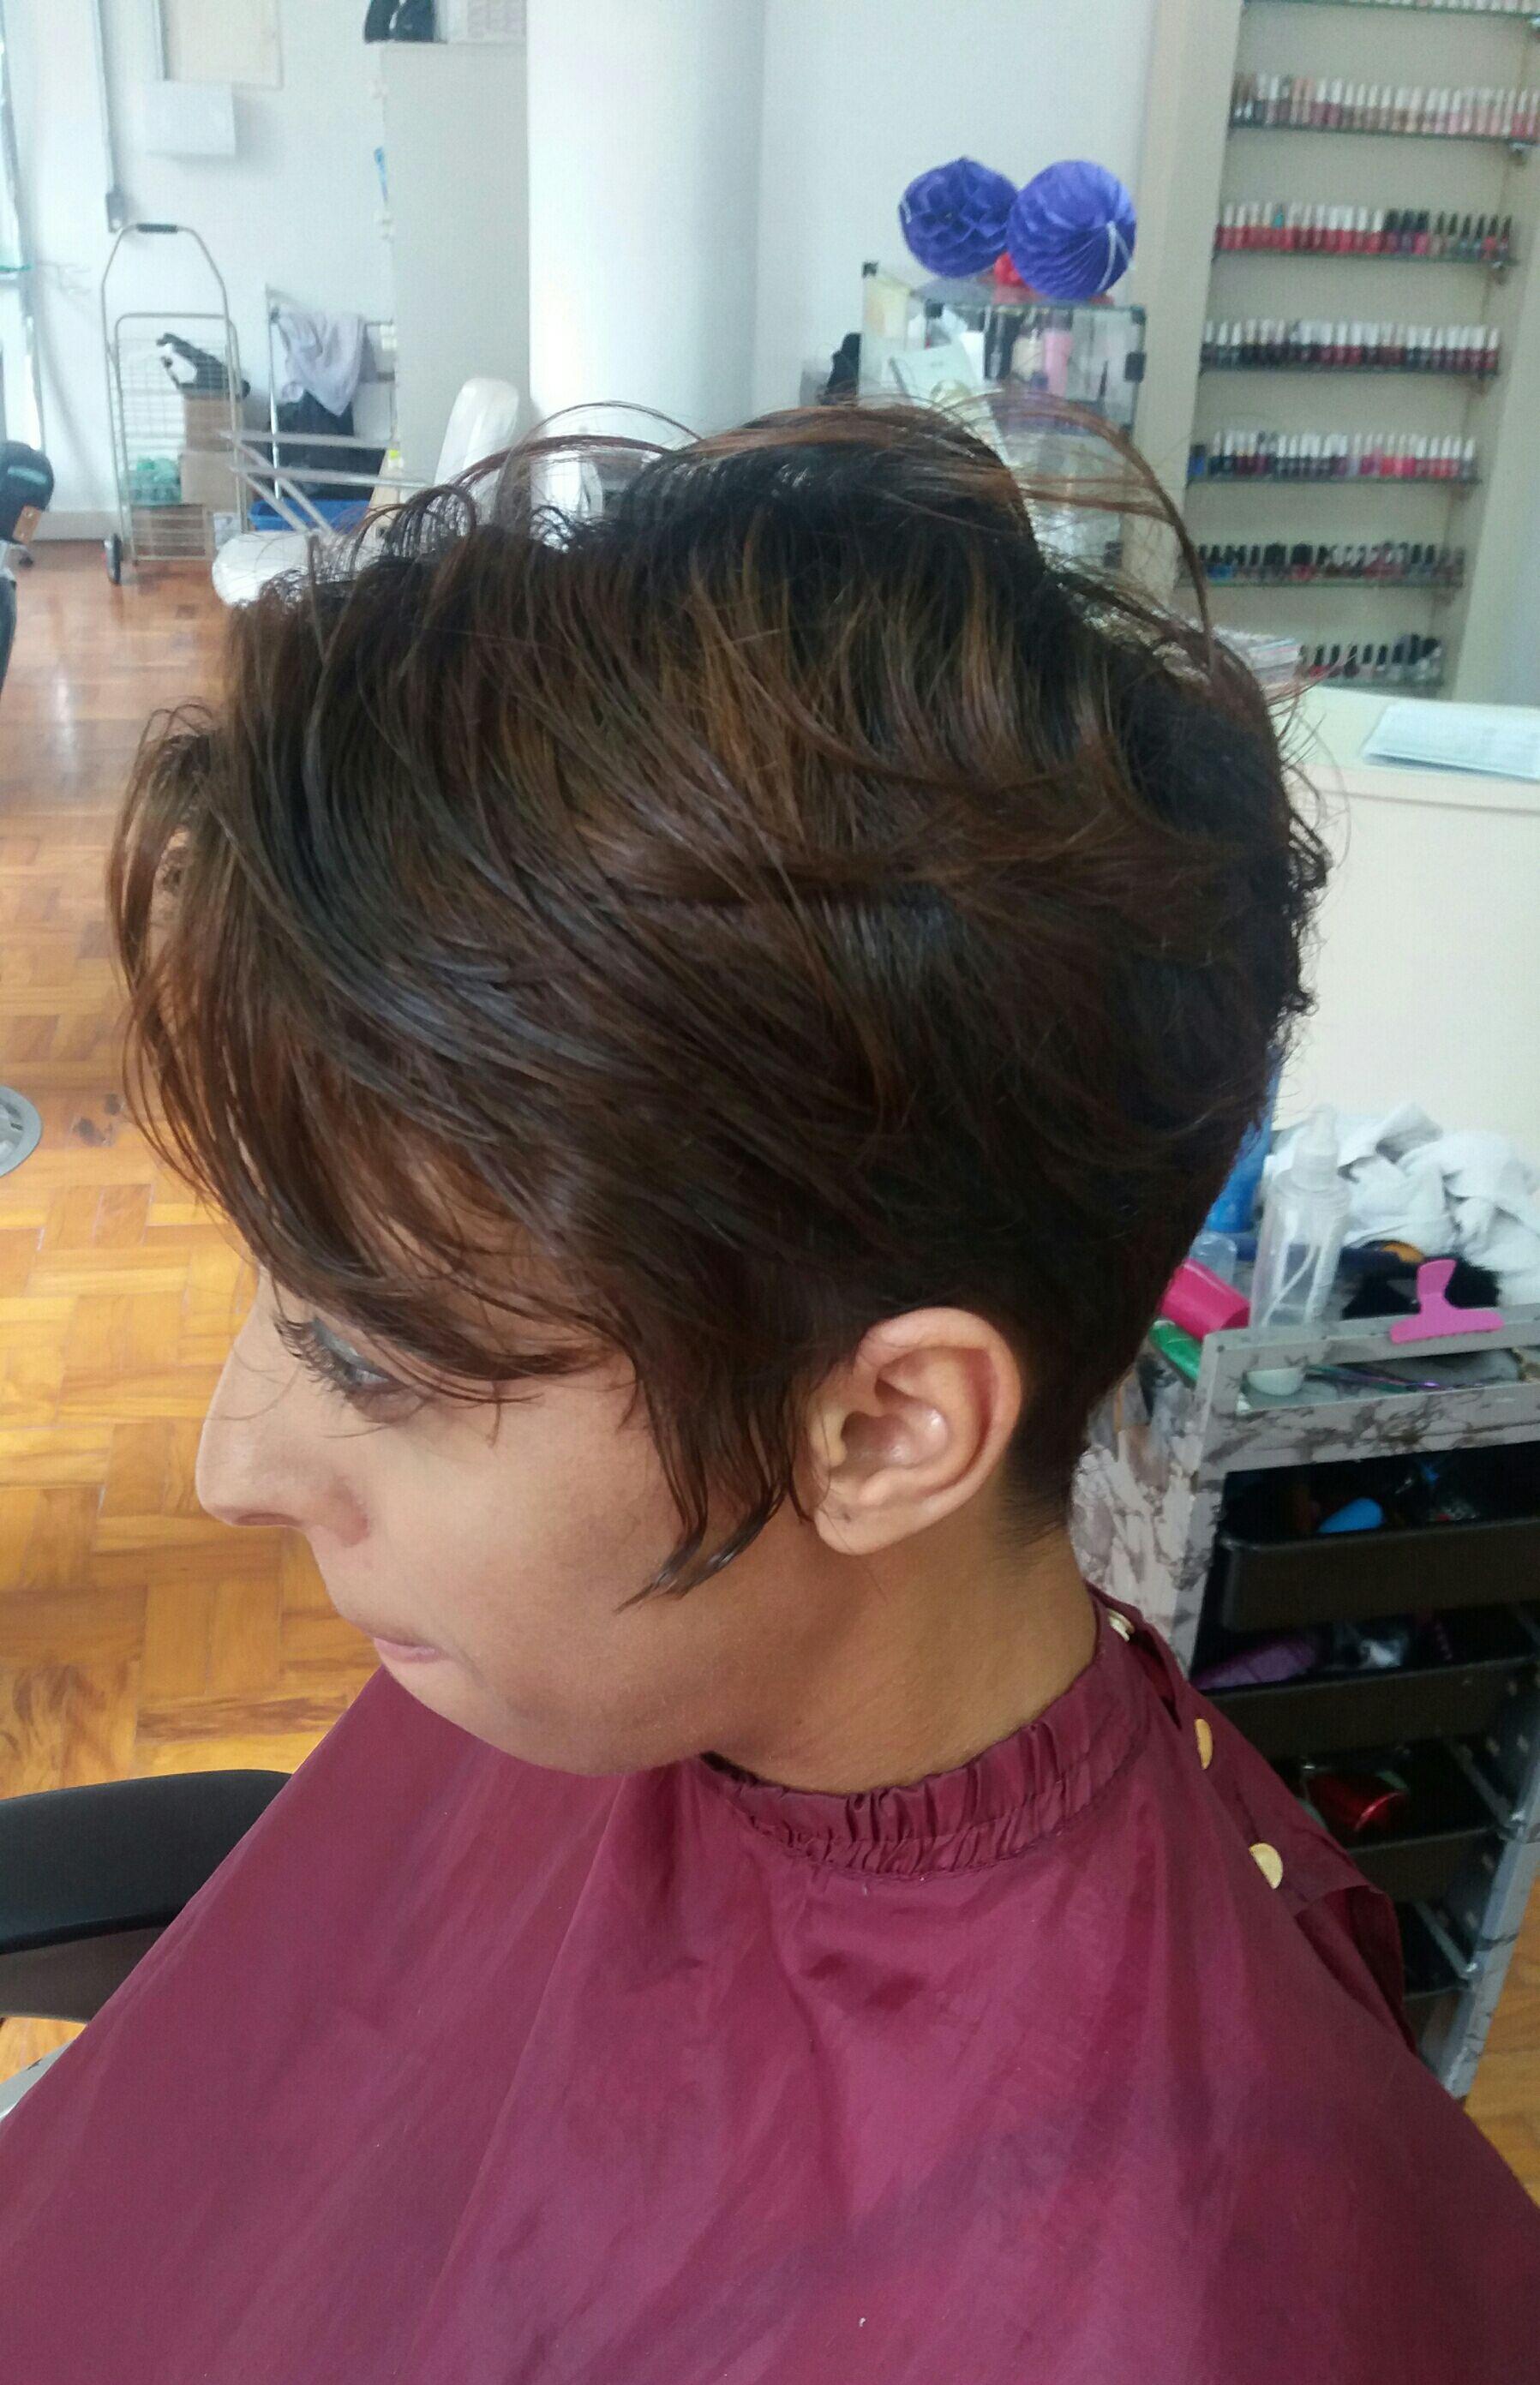 cabelo auxiliar cabeleireiro(a) auxiliar cabeleireiro(a) auxiliar cabeleireiro(a) auxiliar cabeleireiro(a) auxiliar cabeleireiro(a) barbeiro(a) cabeleireiro(a) escovista escovista stylist / visagista auxiliar cabeleireiro(a) barbeiro(a) auxiliar cabeleireiro(a) cabeleireiro(a) cabeleireiro(a) cabeleireiro(a) cabeleireiro(a)